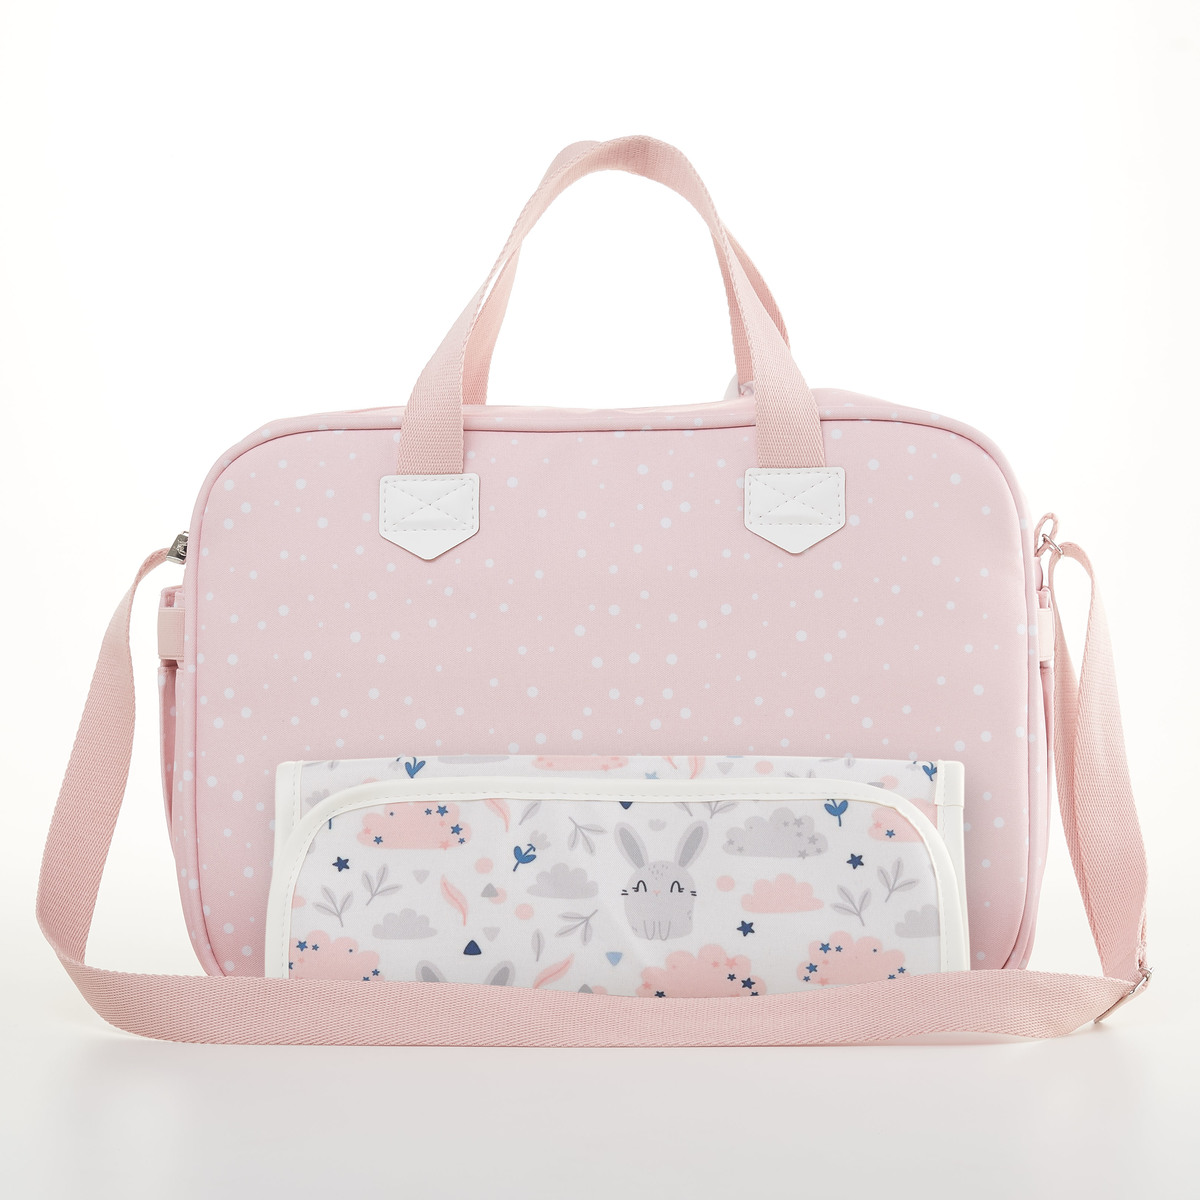 Kit Mala Maternidade + Bolsa Bebê + Frasqueira Térmica Bunny Rosa - Just Baby